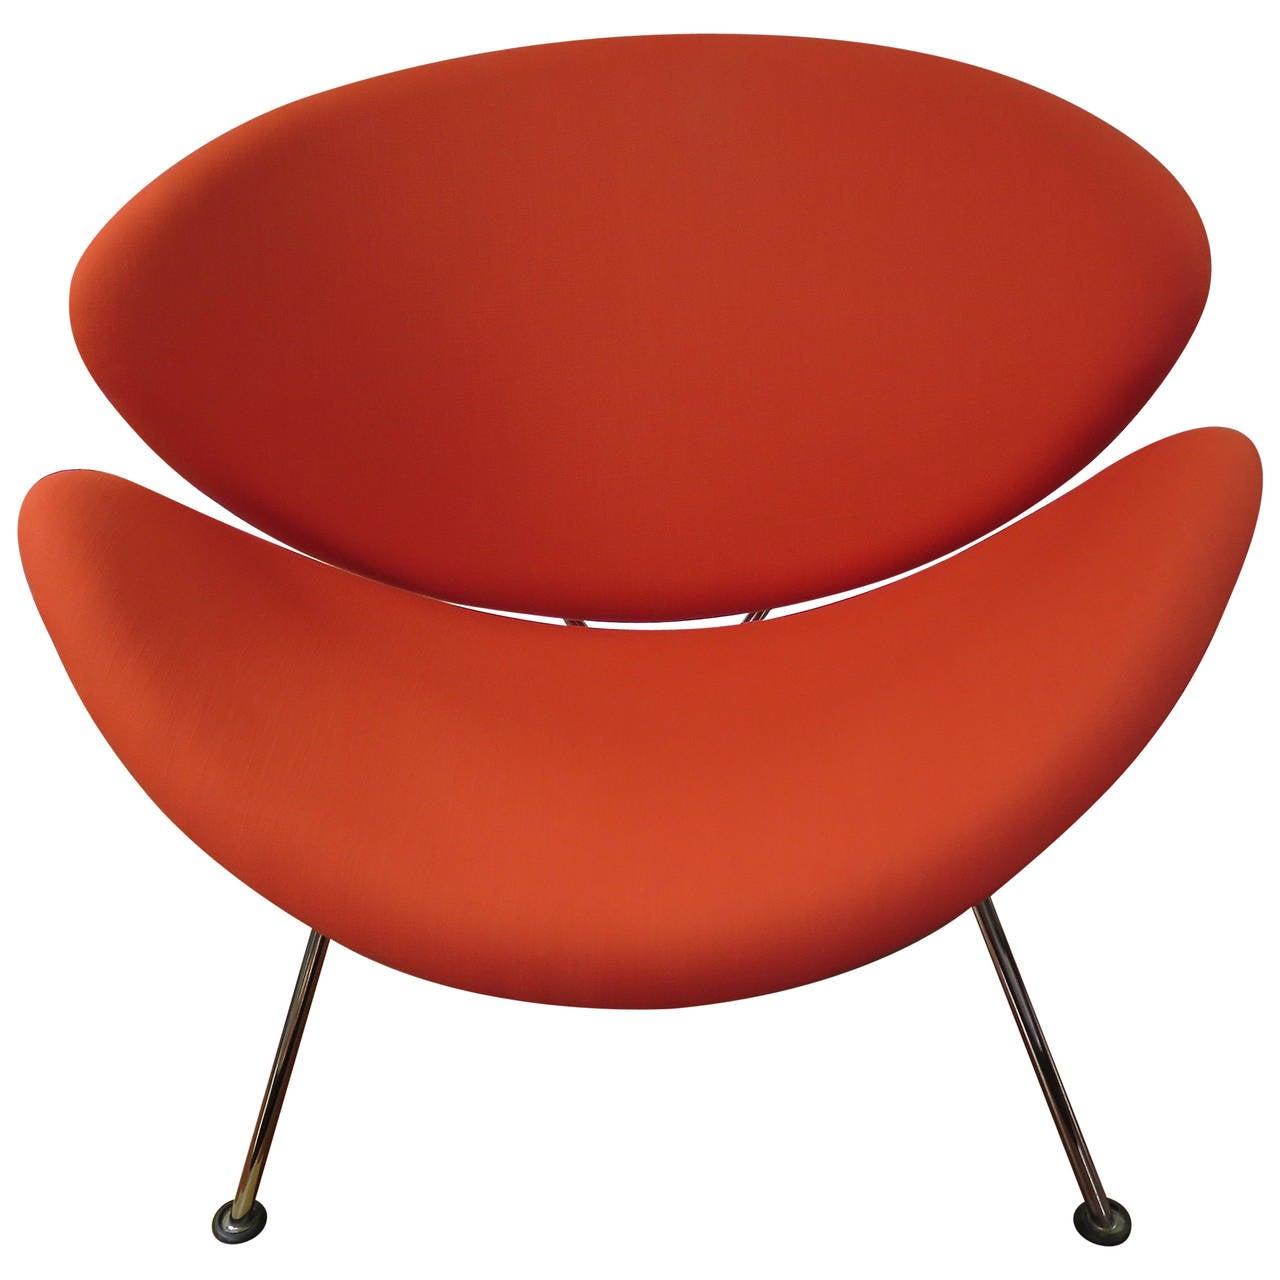 orange slice chair dressing table vibrant 1960s pierre paulin for artifort